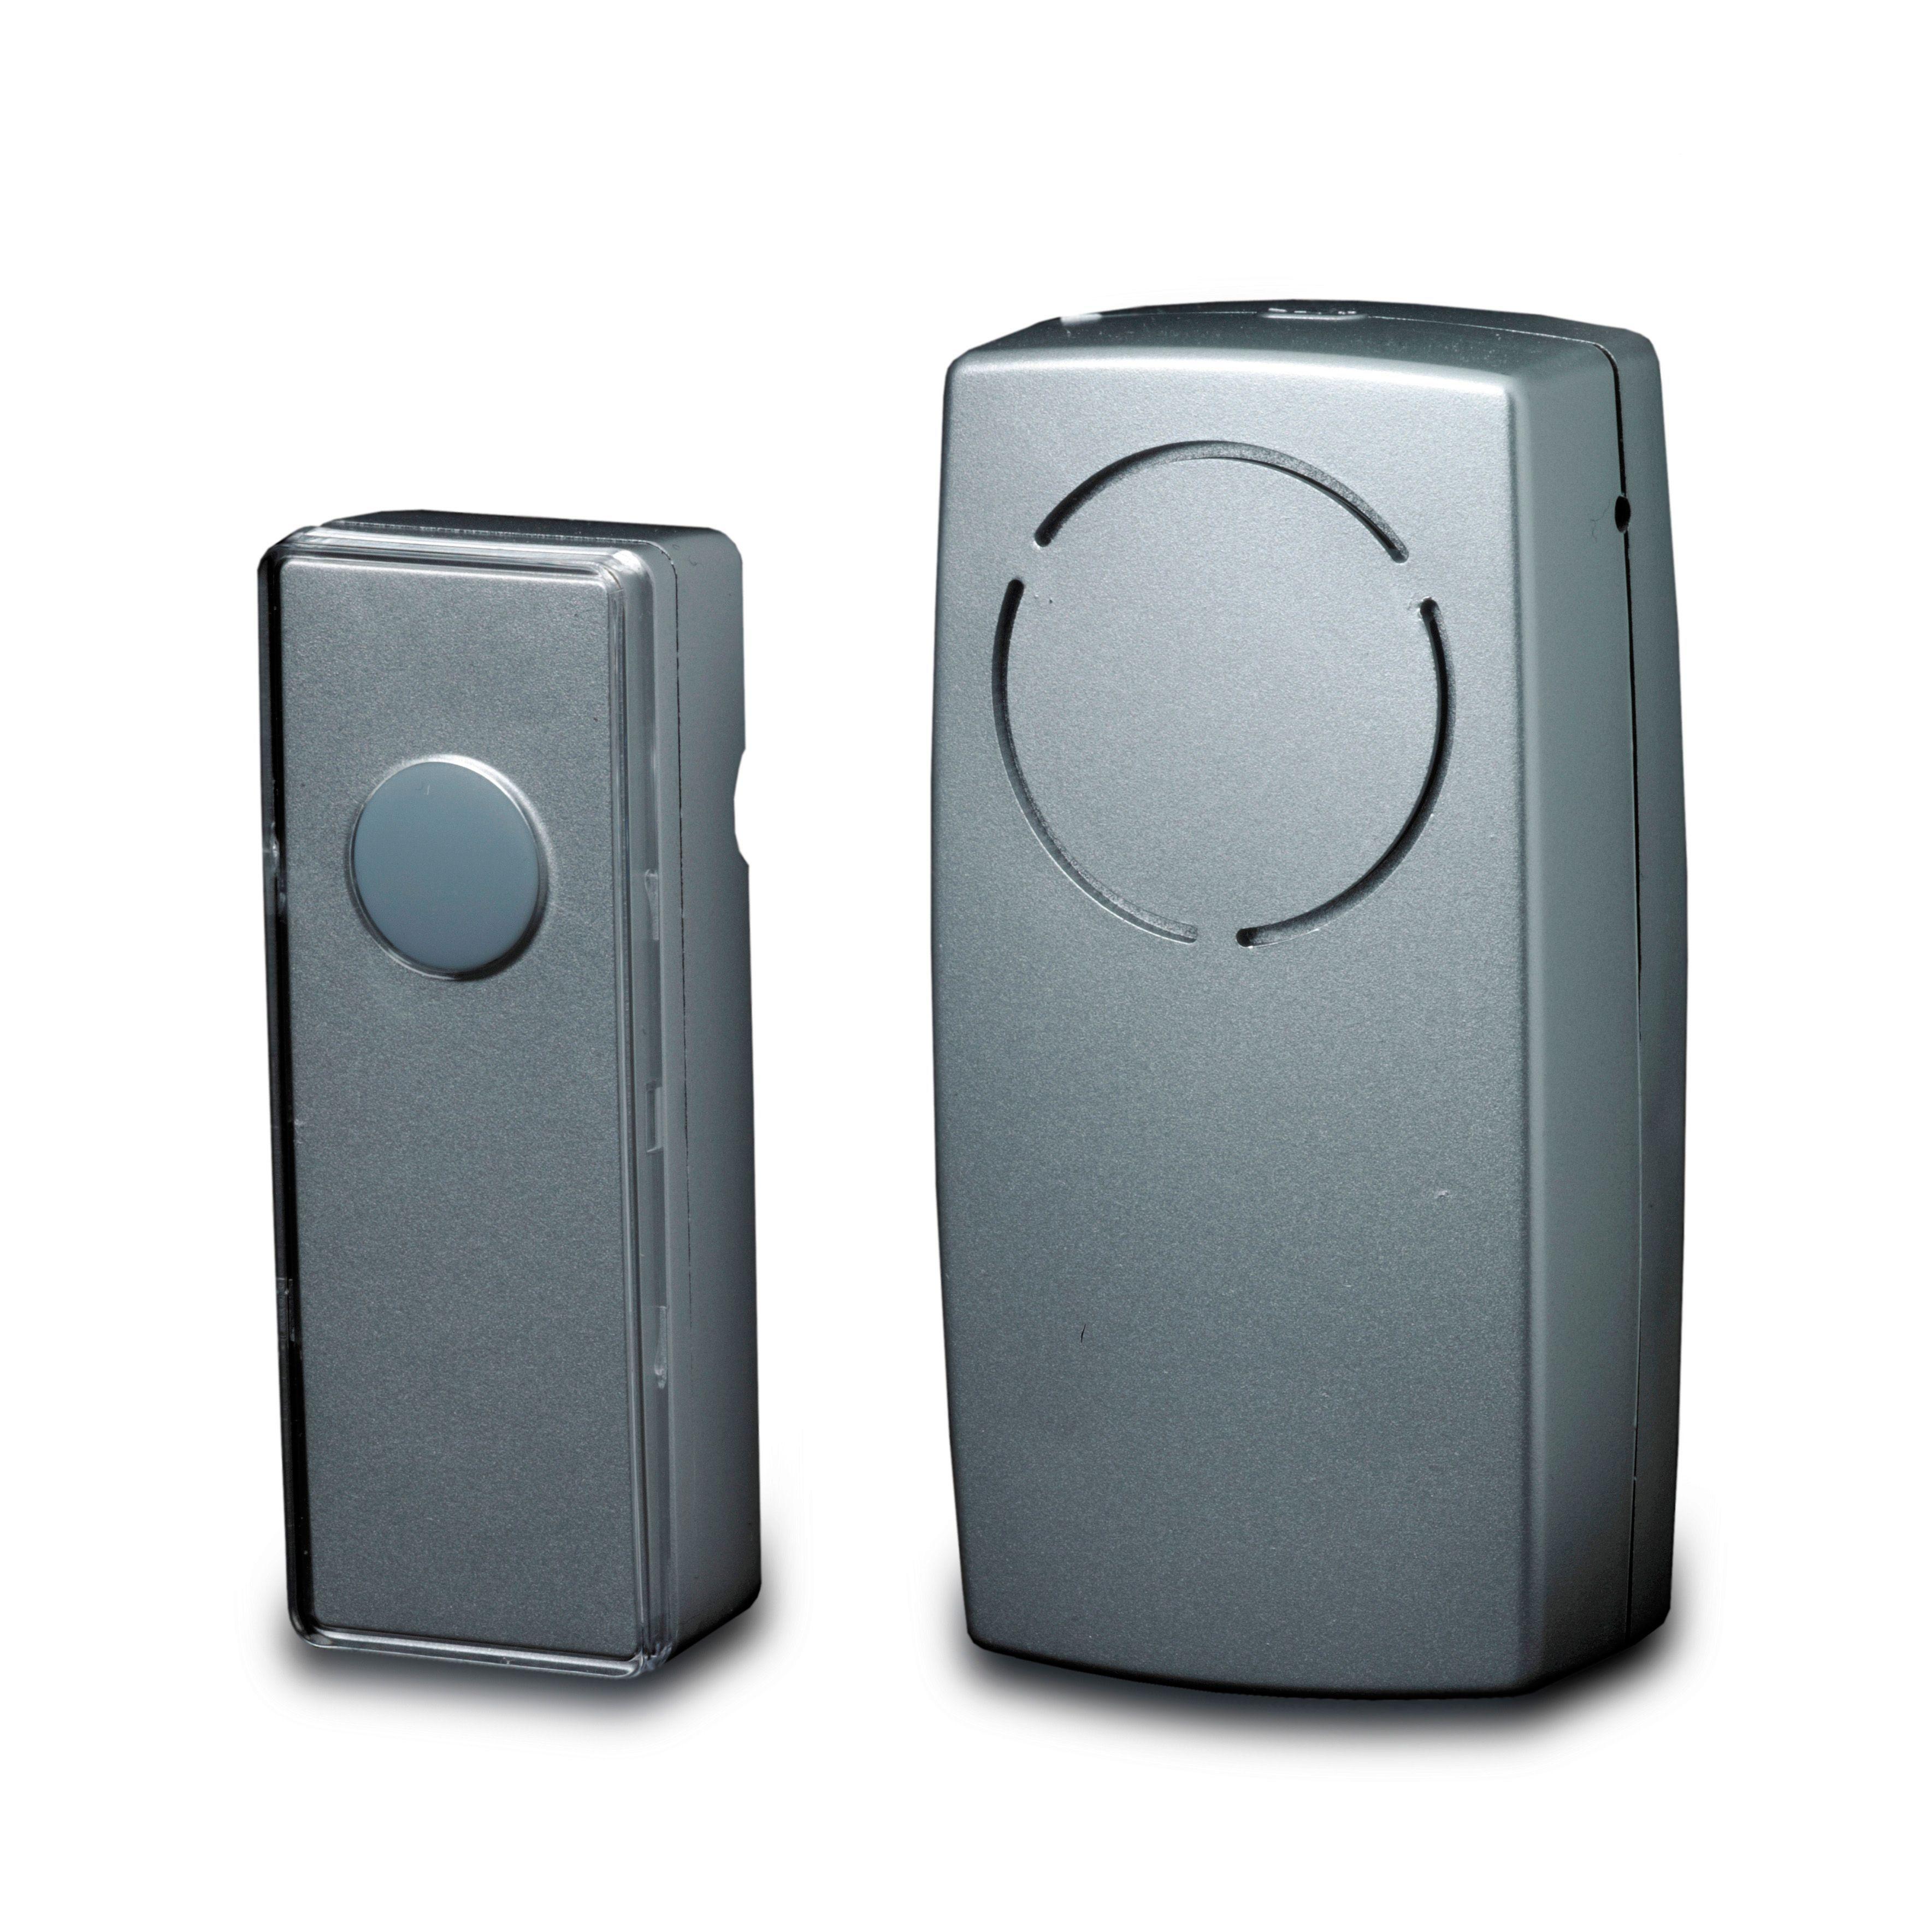 Blyss Wireless Door Bell Kit   Departments   DIY at B&Q